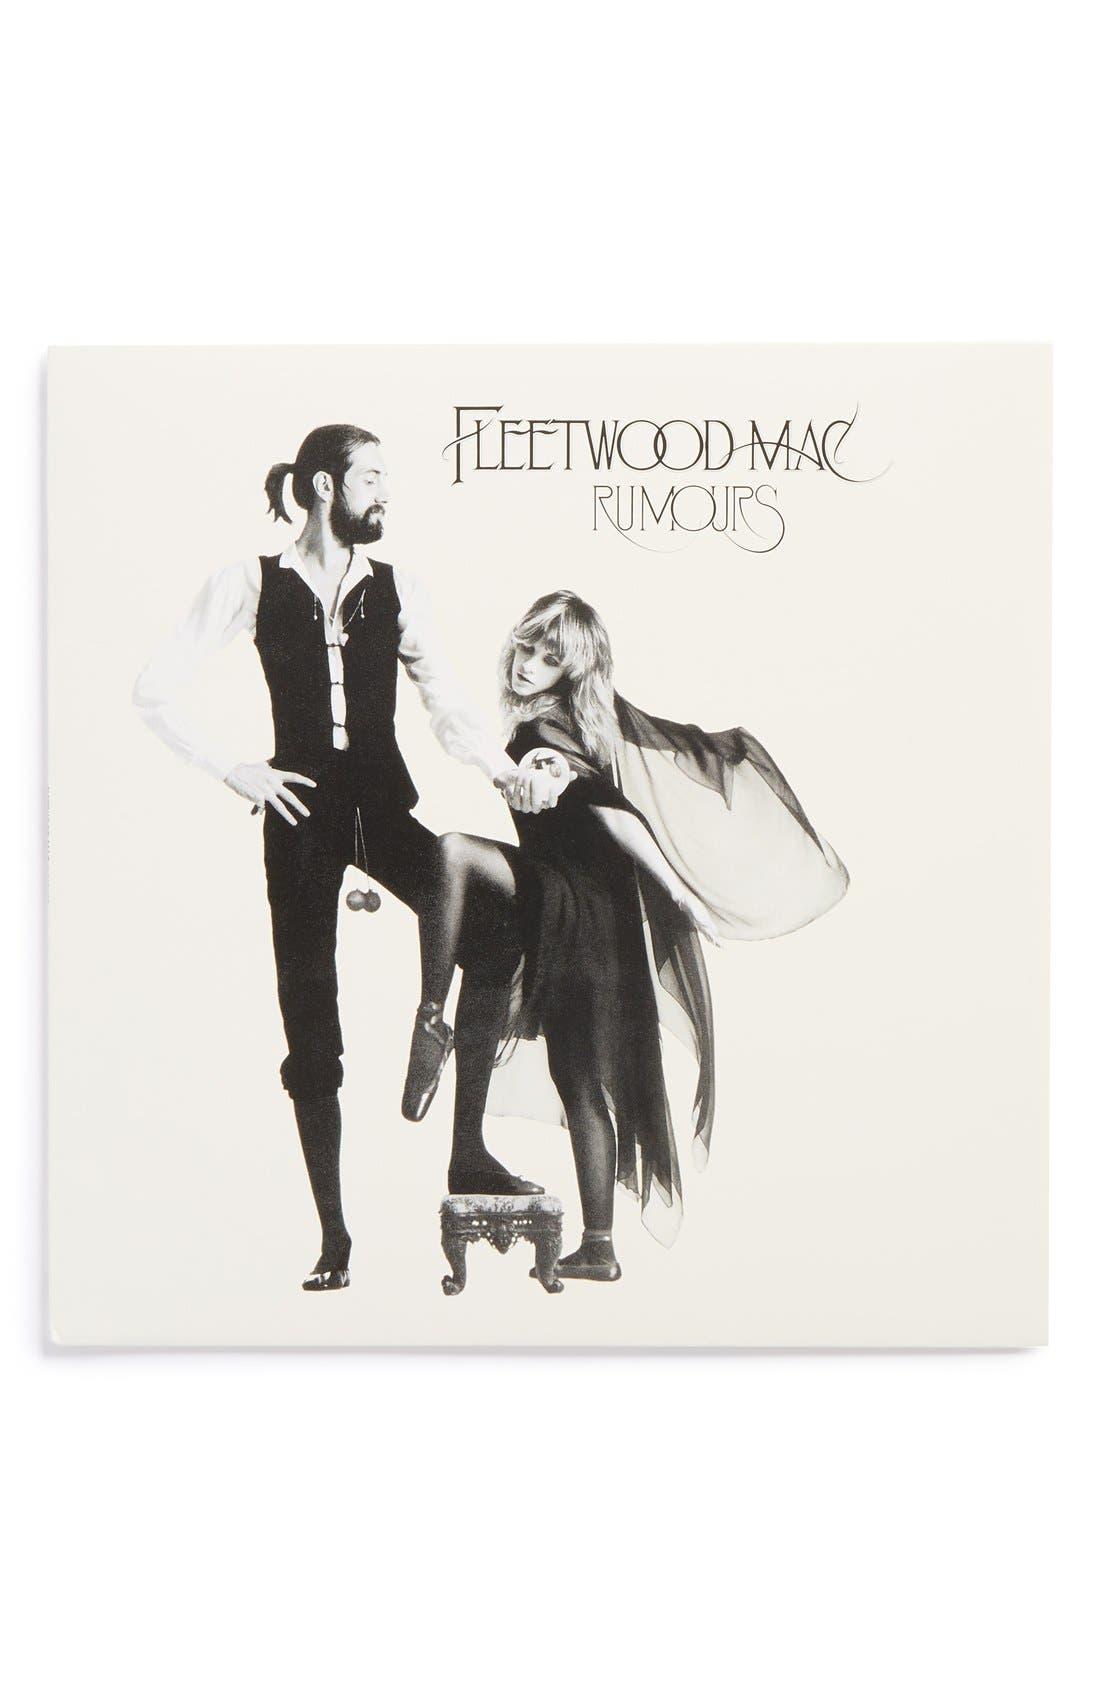 Fleetwood Mac 'Rumours' LP Vinyl Record,                             Main thumbnail 1, color,                             001